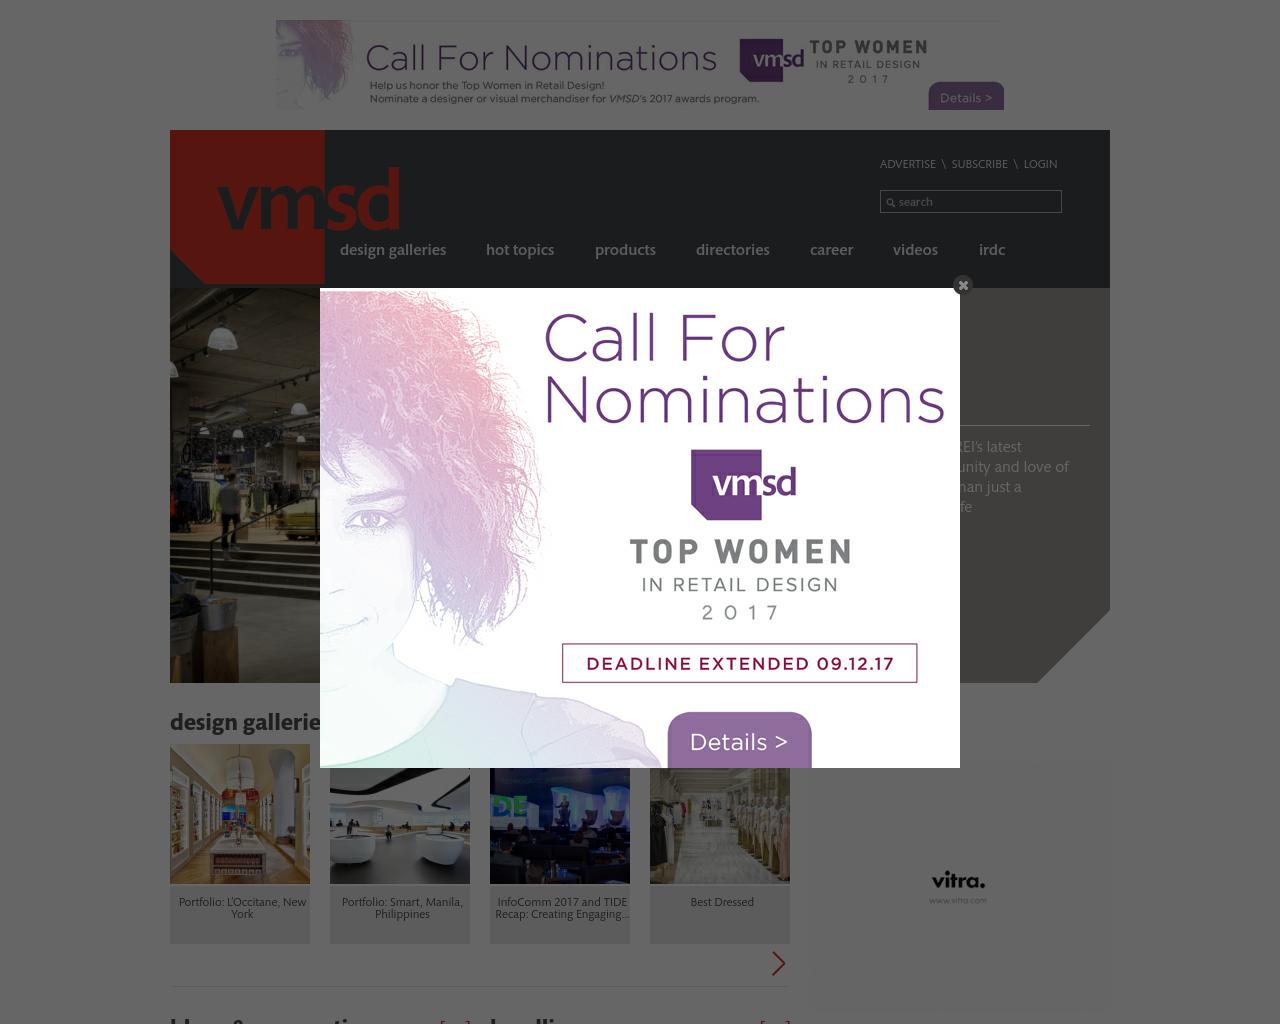 VMSD-Advertising-Reviews-Pricing